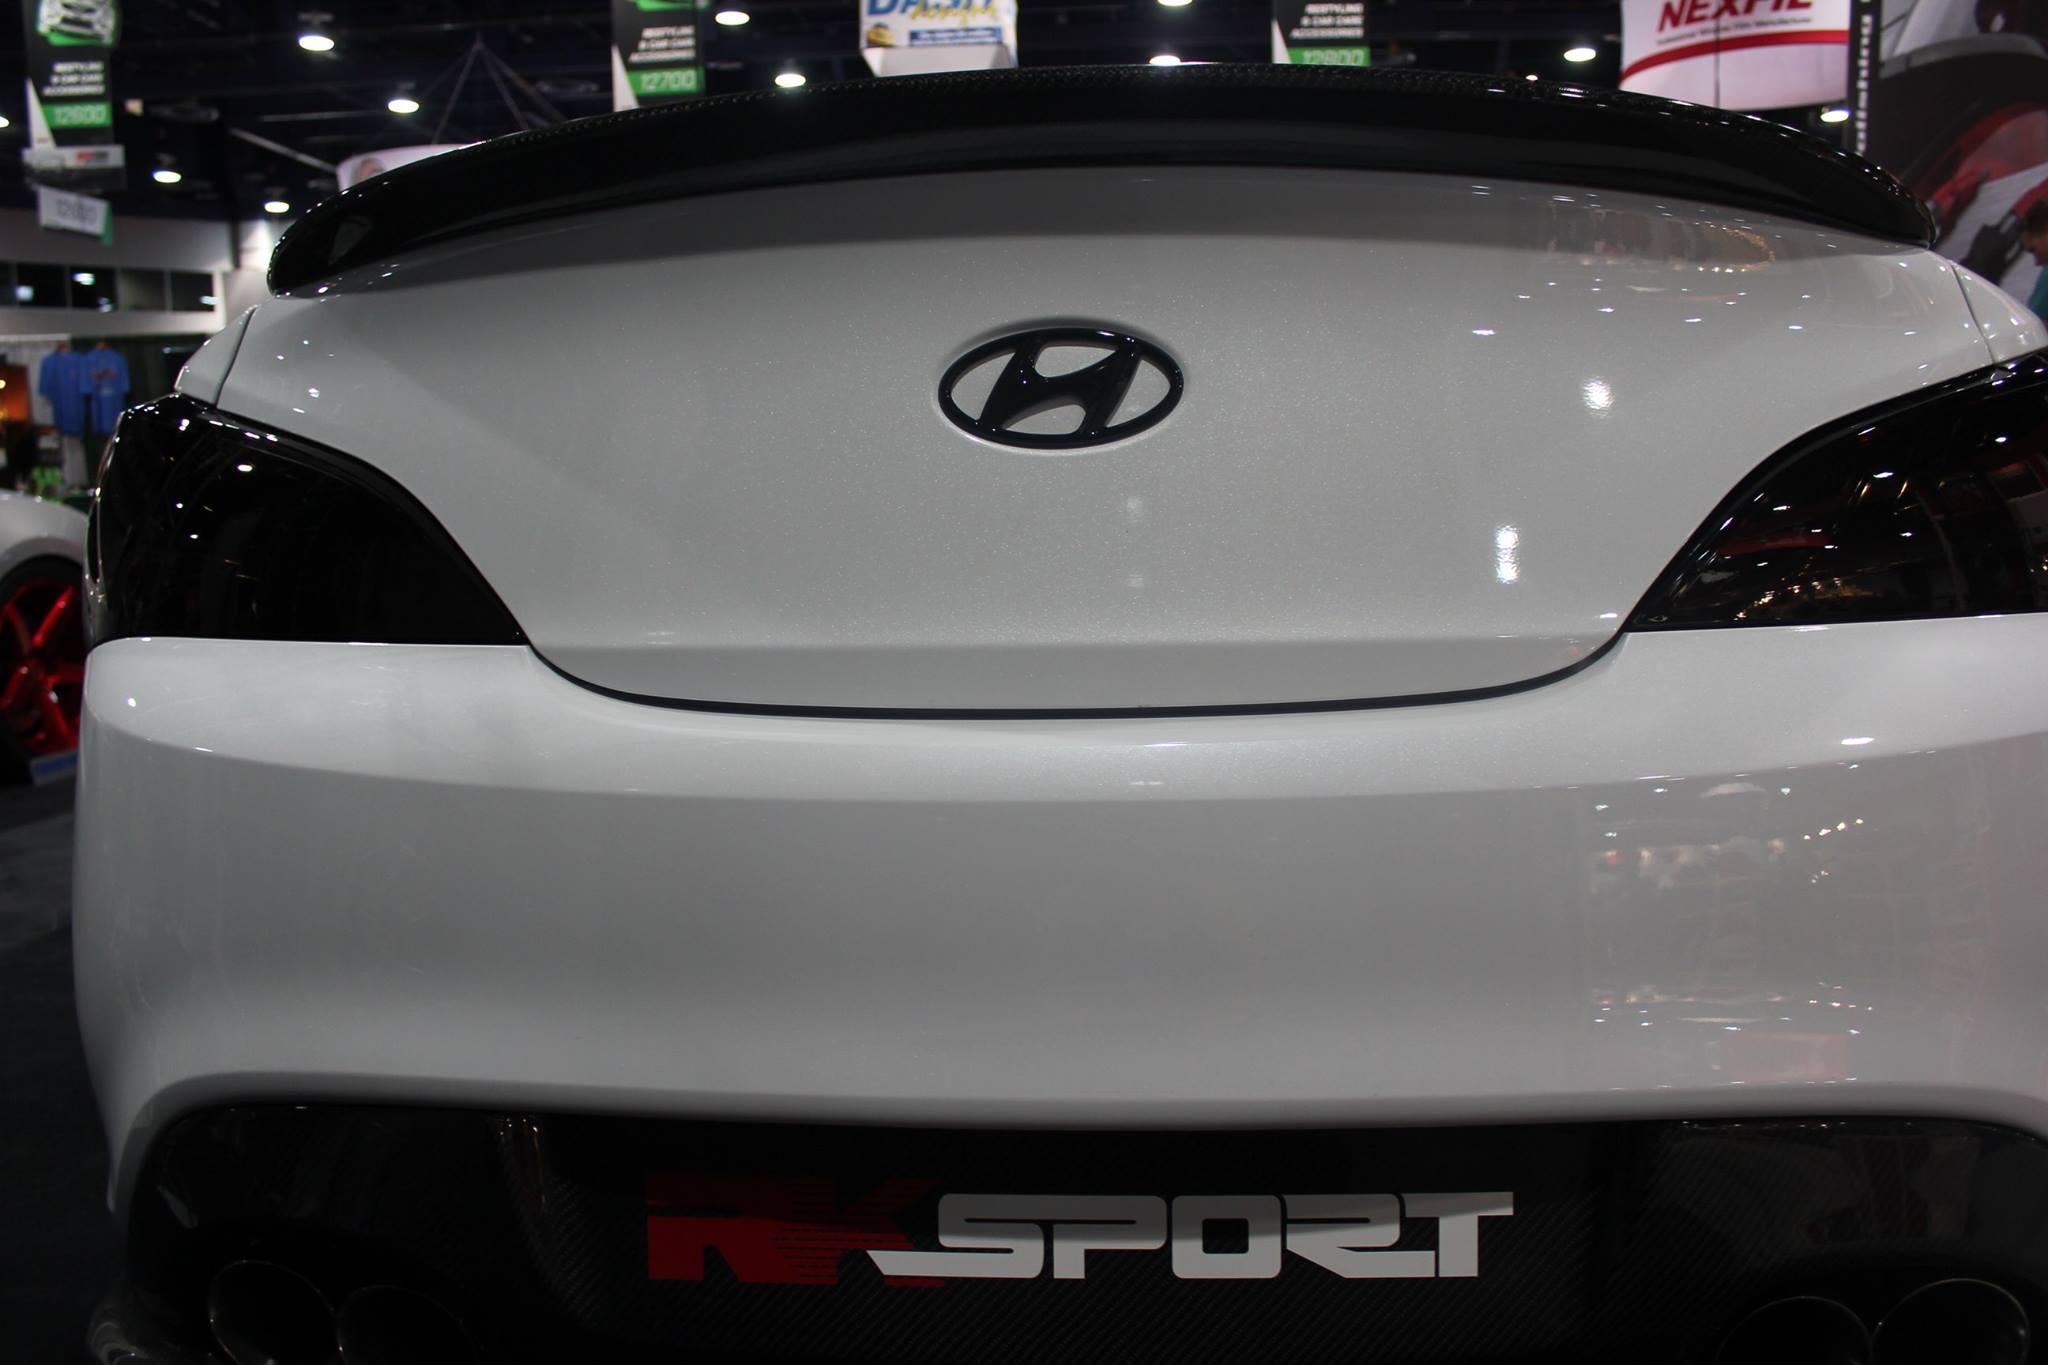 RK Sport Carbon Fiber/Fiberglass Trunk Lip Spoiler Genesis Coupe 2010 2015